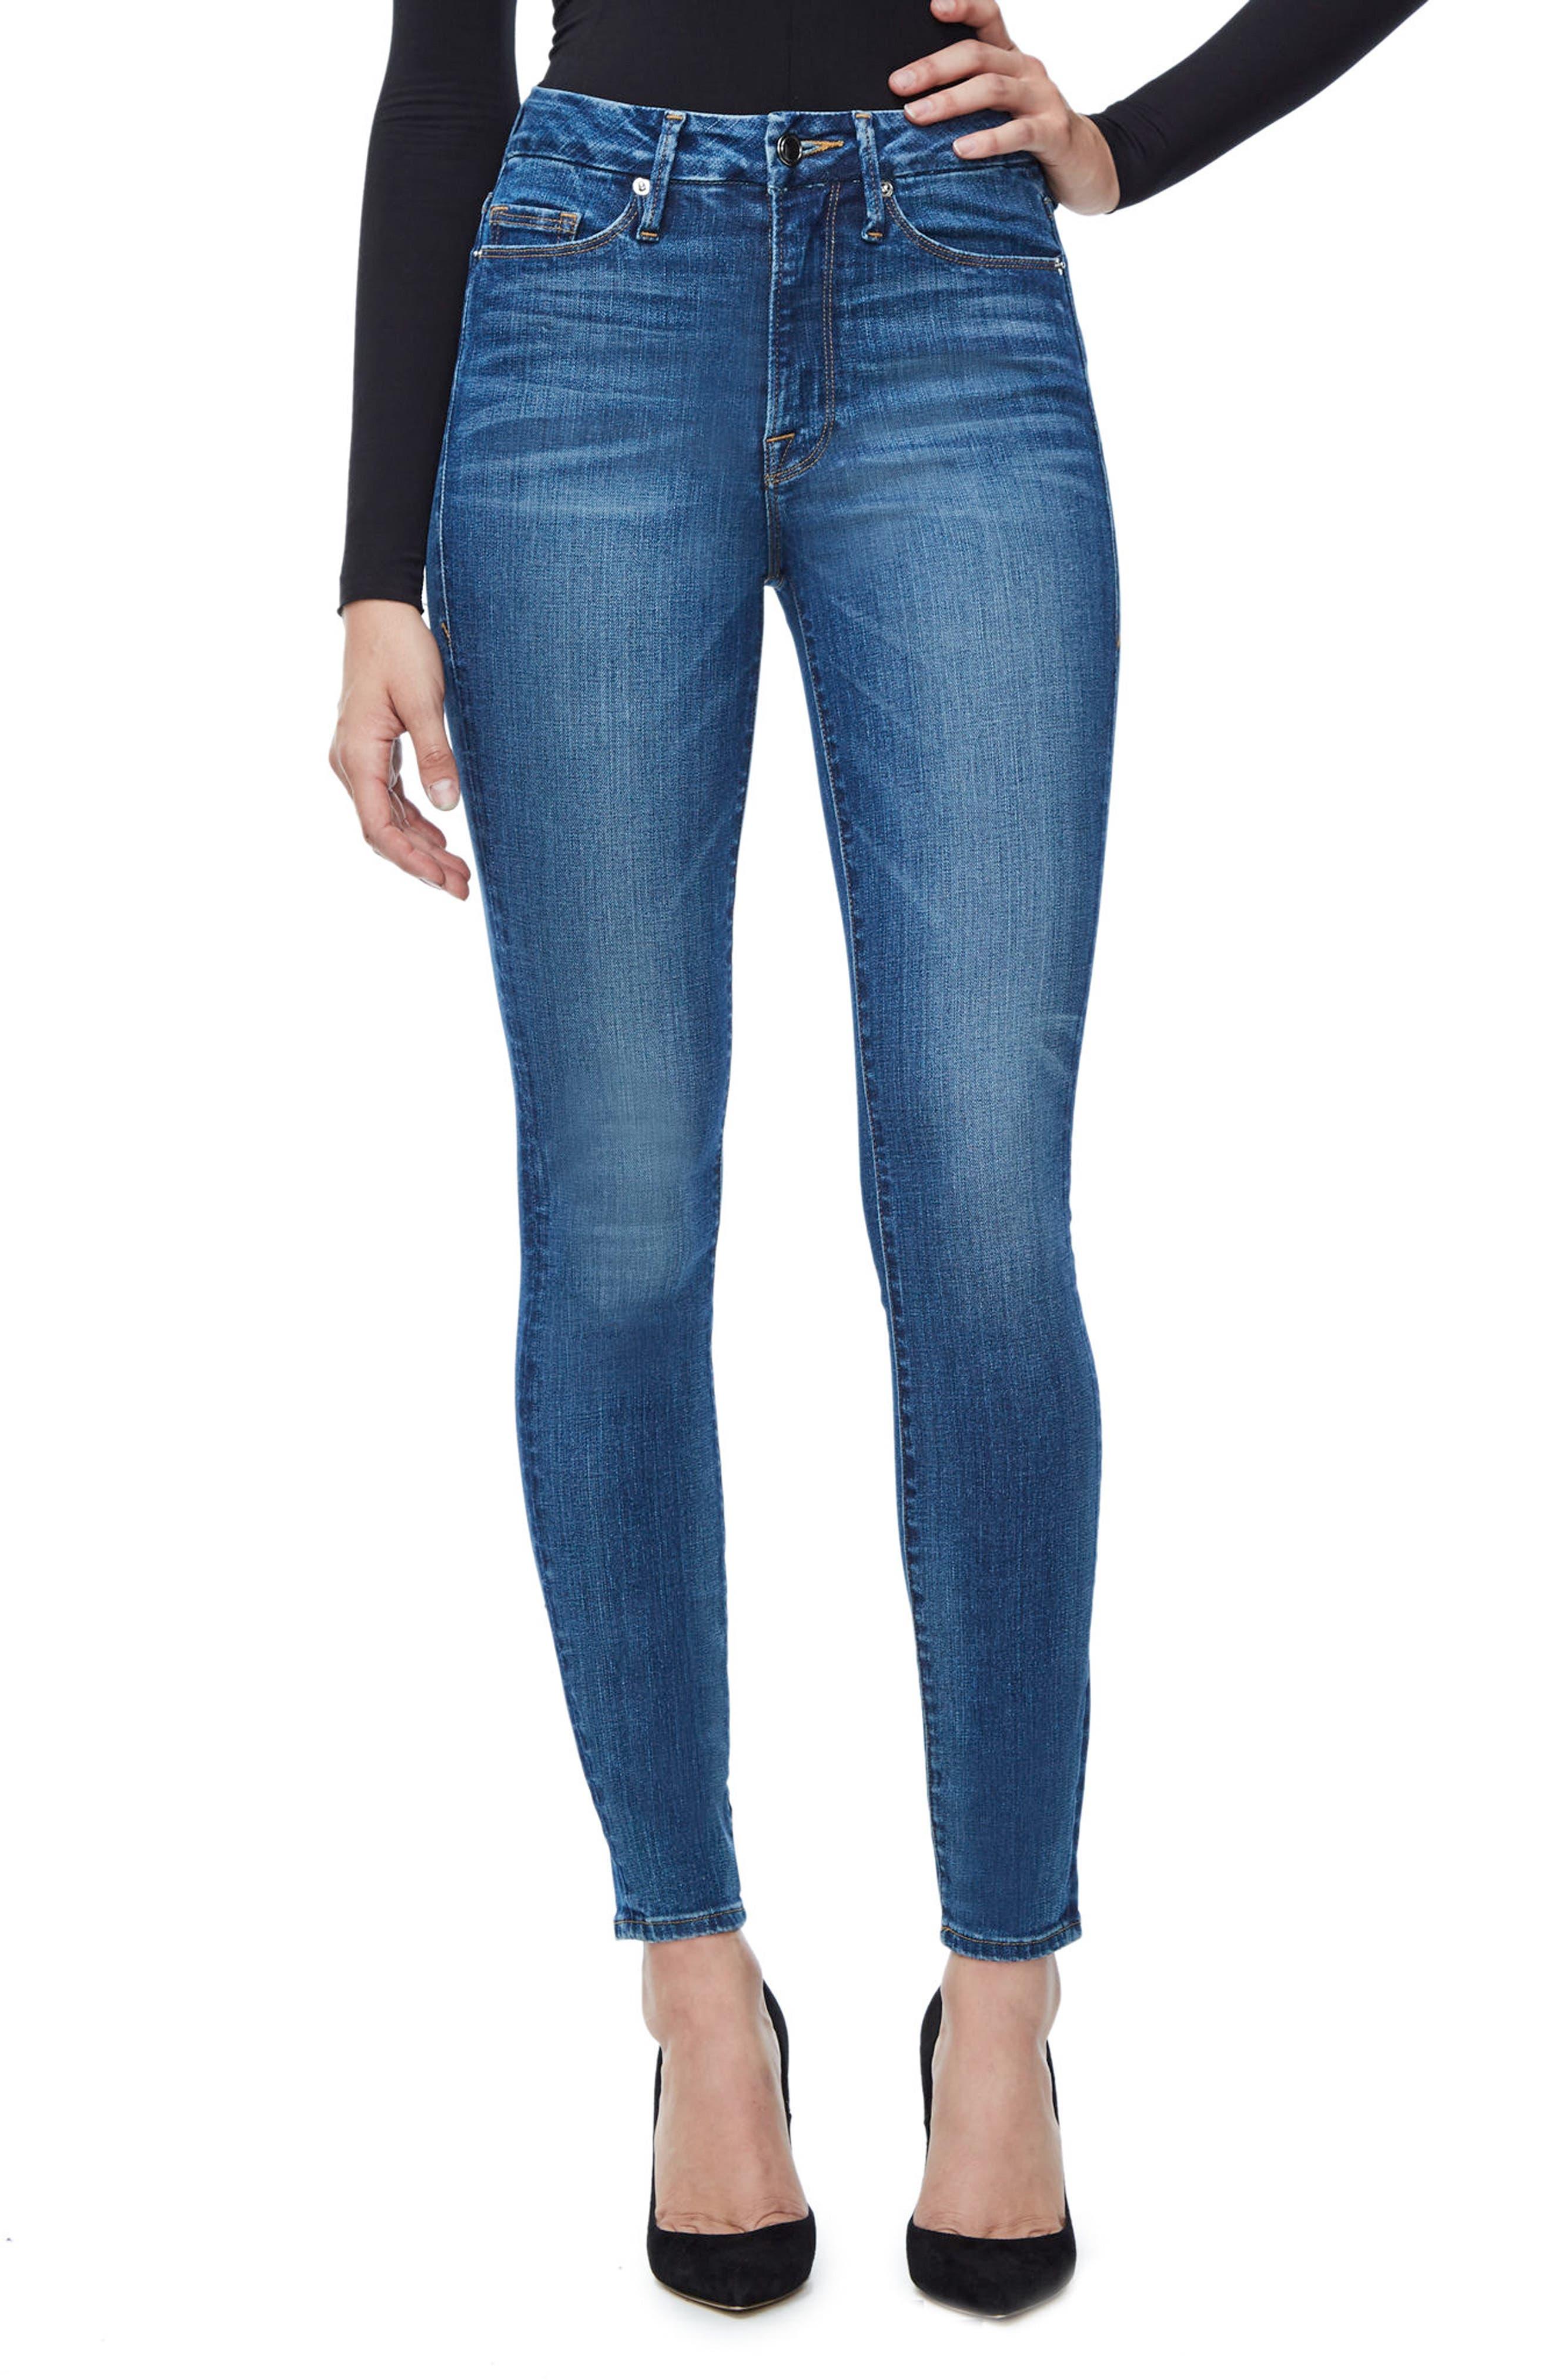 Main Image - Good American Good Waist High Waist Skinny Jeans (Blue 093) (Extended Sizes)